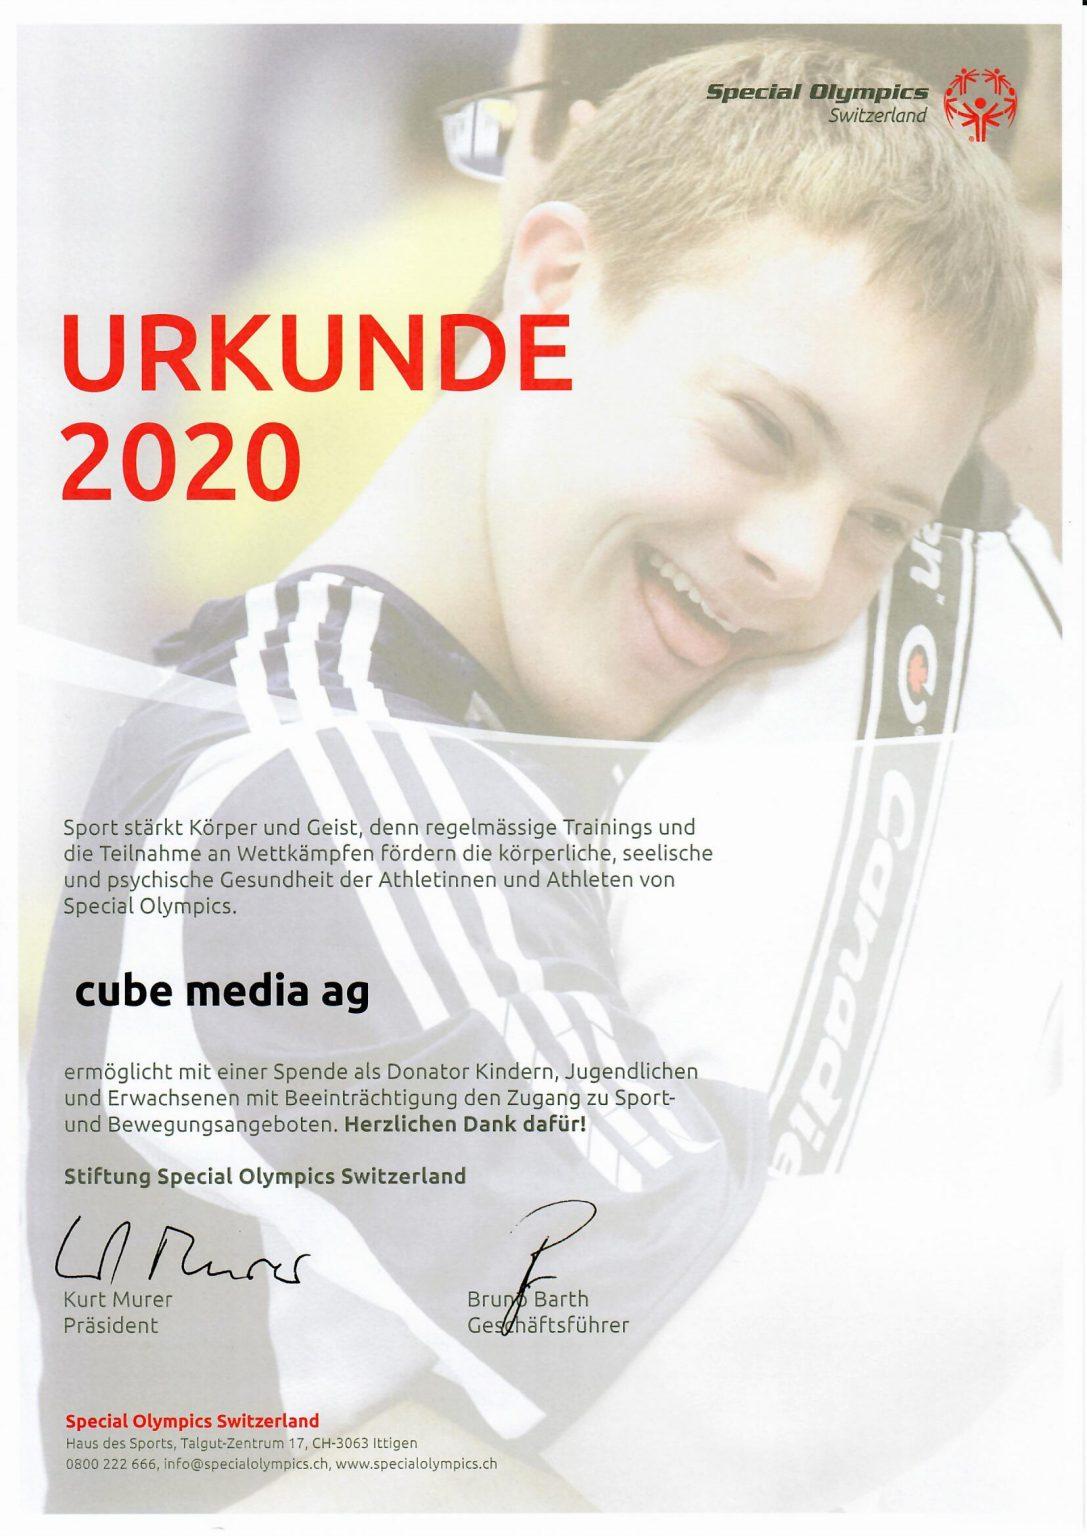 Special Olympics Switzerland - cube media AG 1